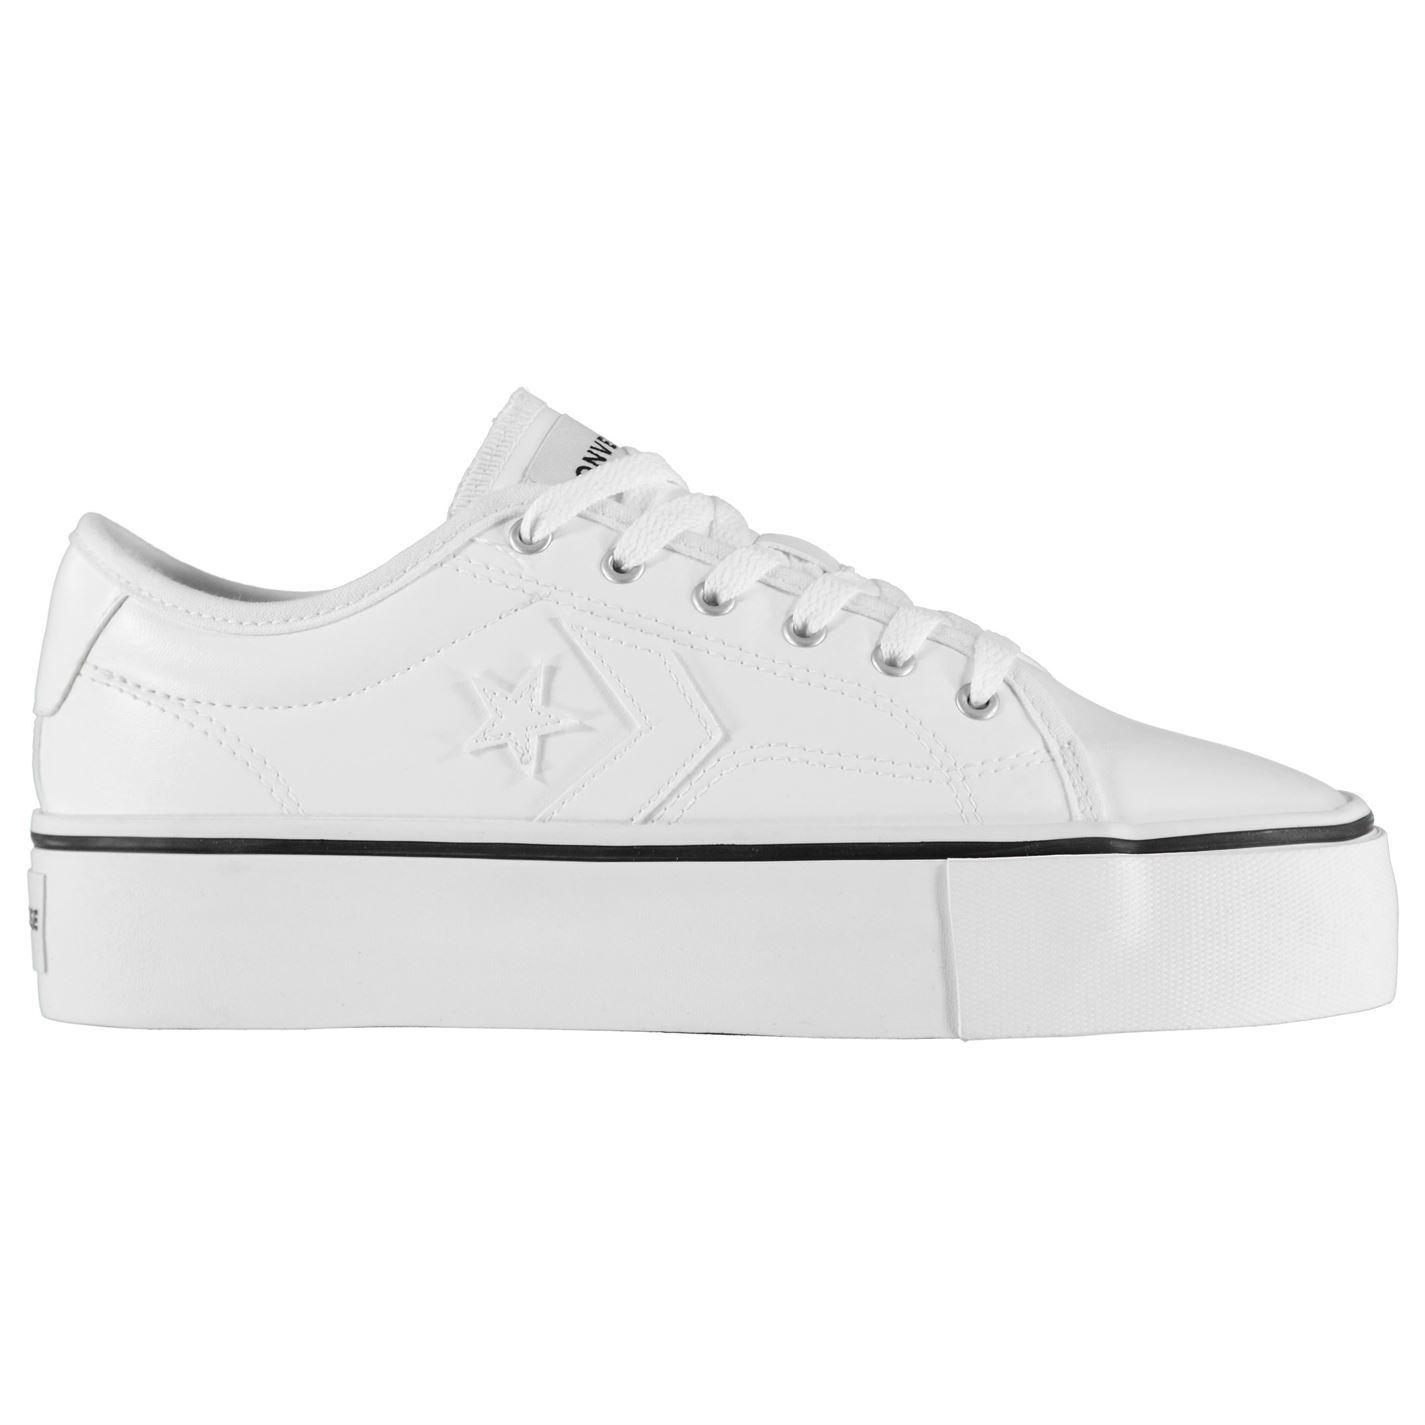 Details zu Converse Replay Plateau Turnschuhe Damen Schuhe Weiß Damen Freizeit Schuhwerk